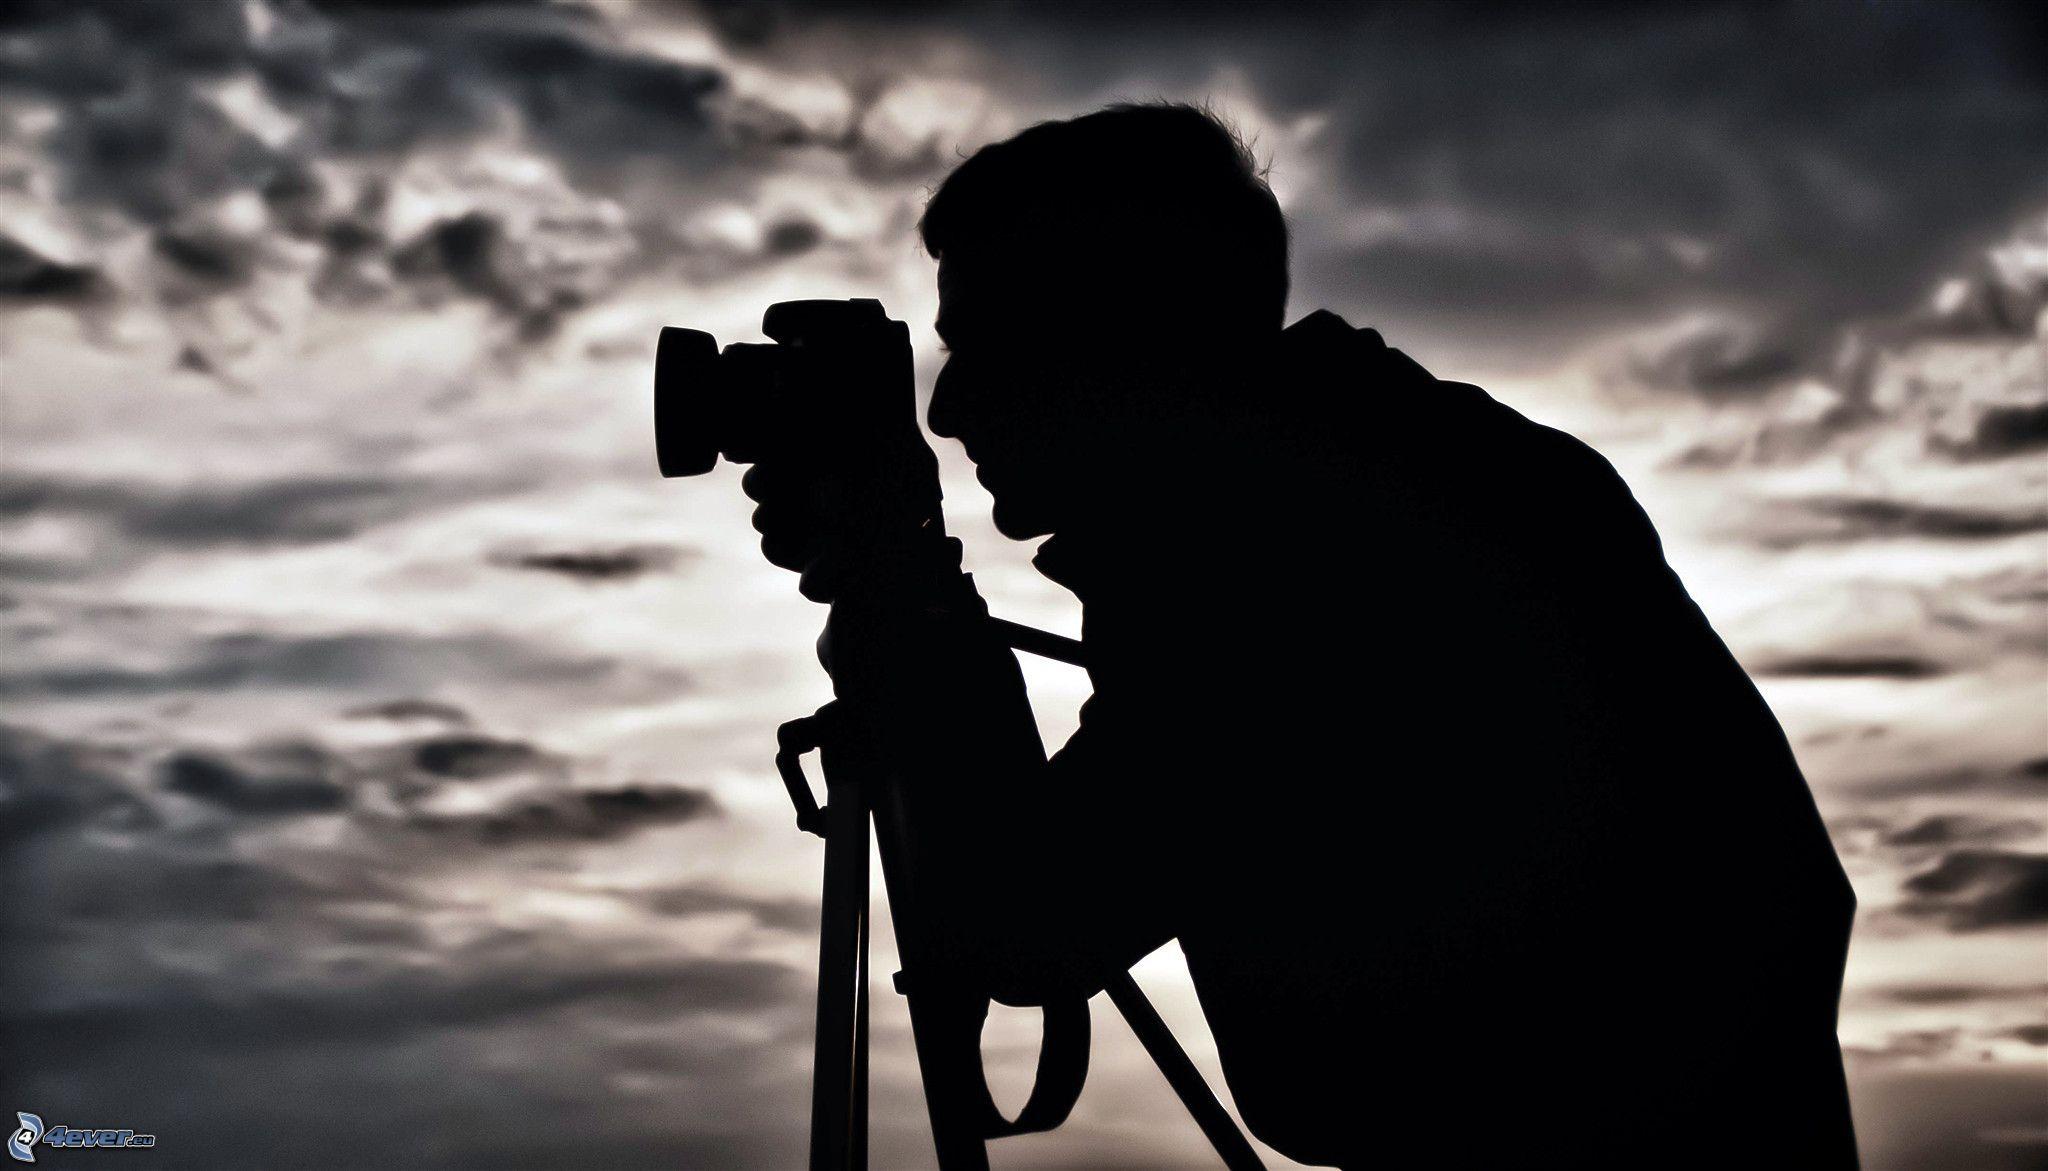 Resultado de imagen de fotografo silueta